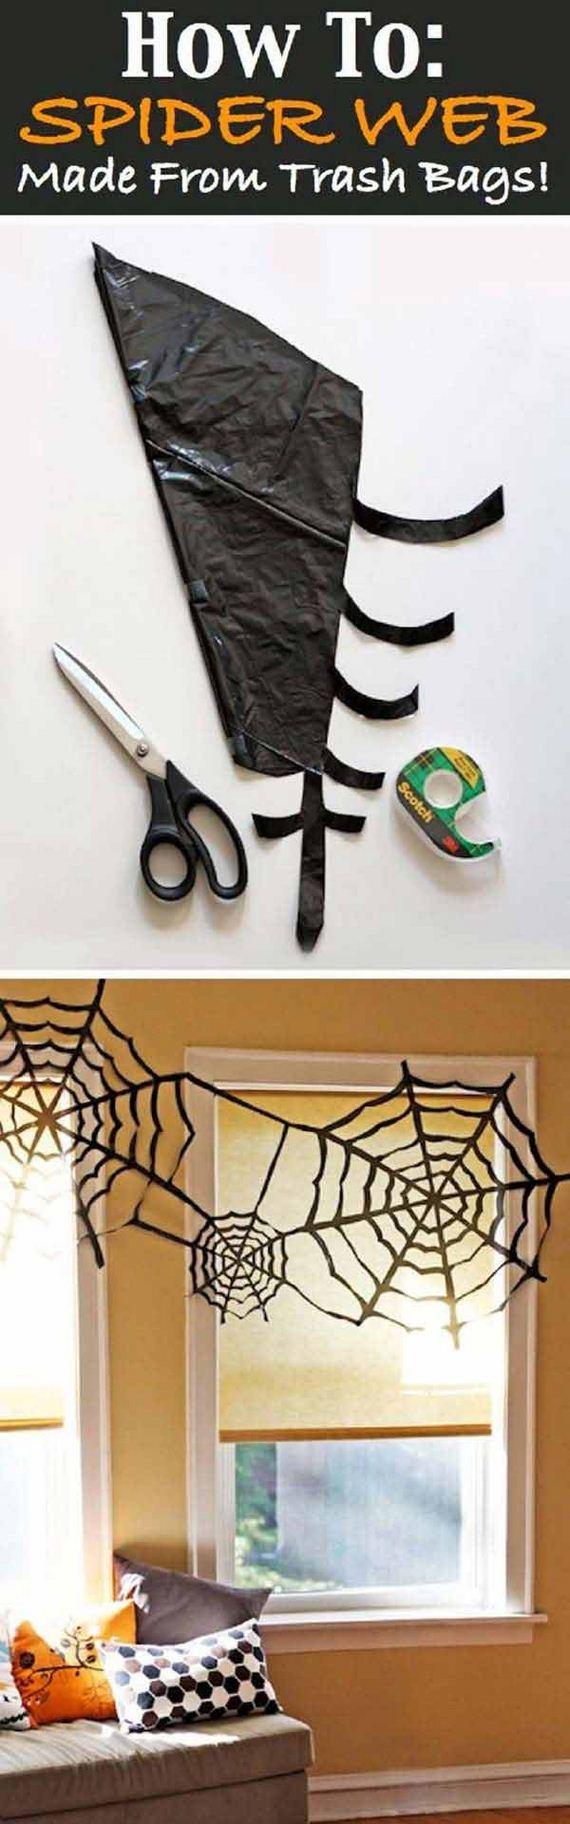 20-last-minute-halloween-crafts